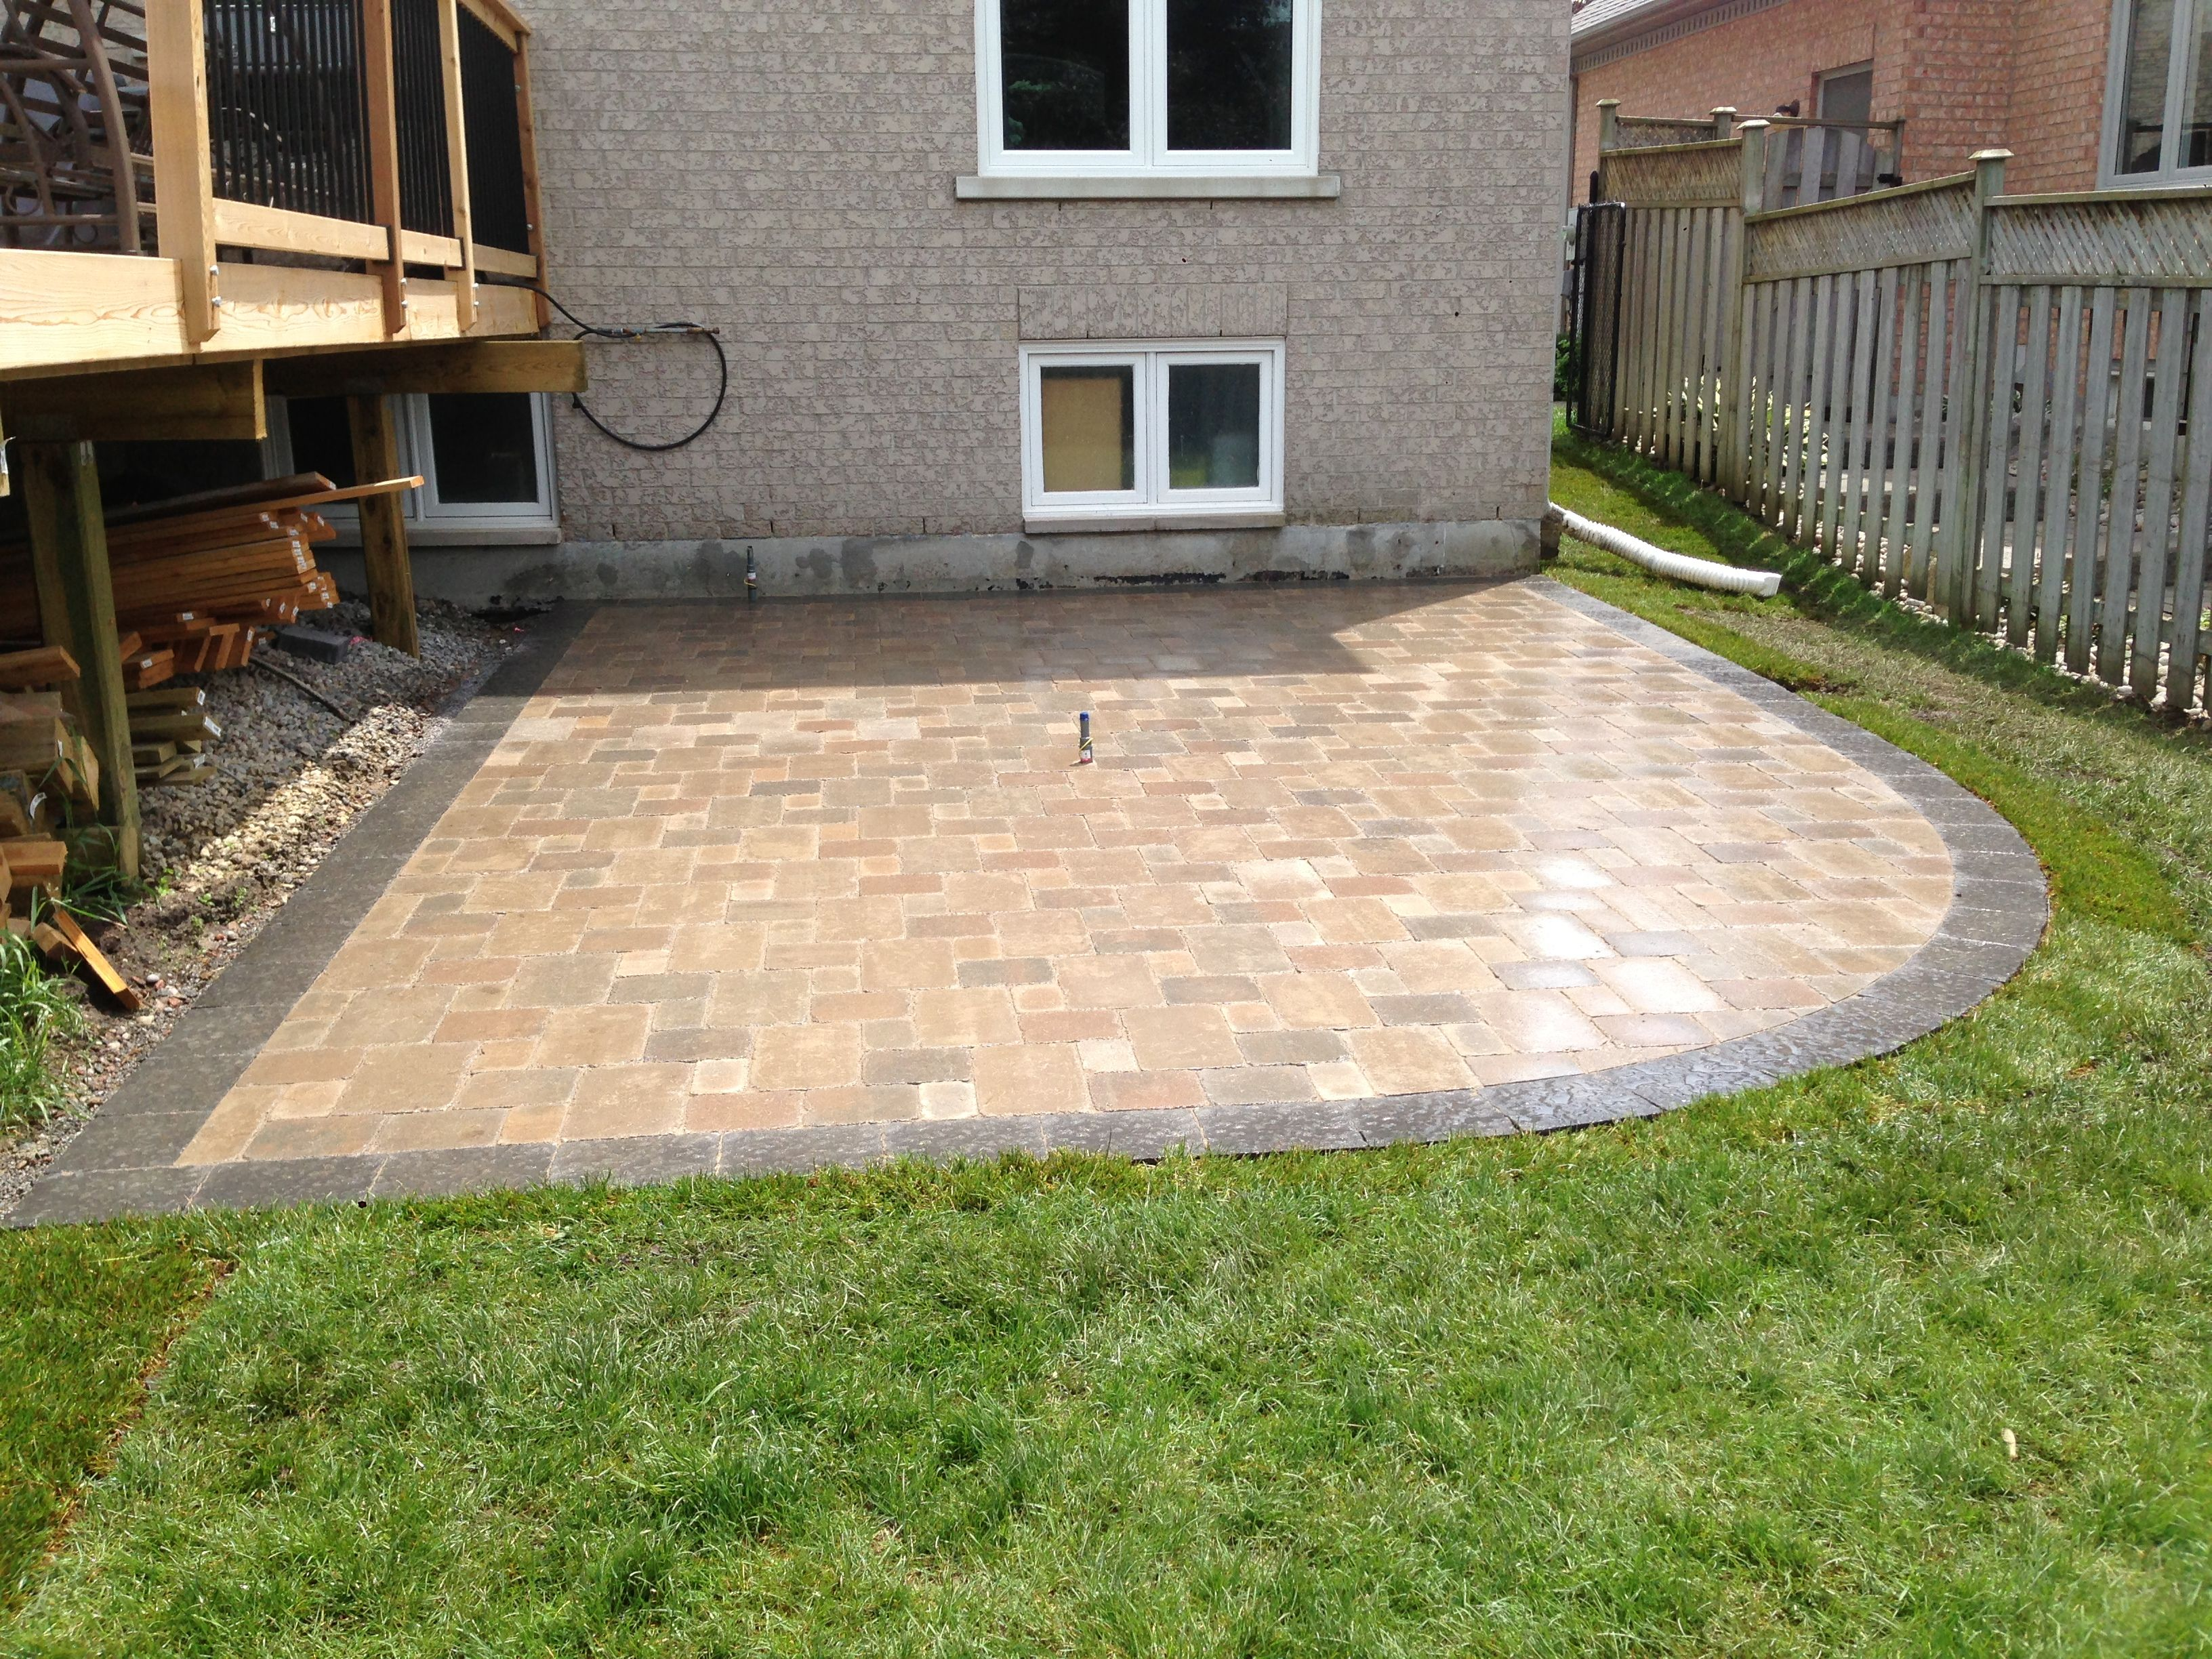 "Unilock ""brussels block"" patio | Patio, Outdoor decor ... on Unilock Patio Ideas id=46462"